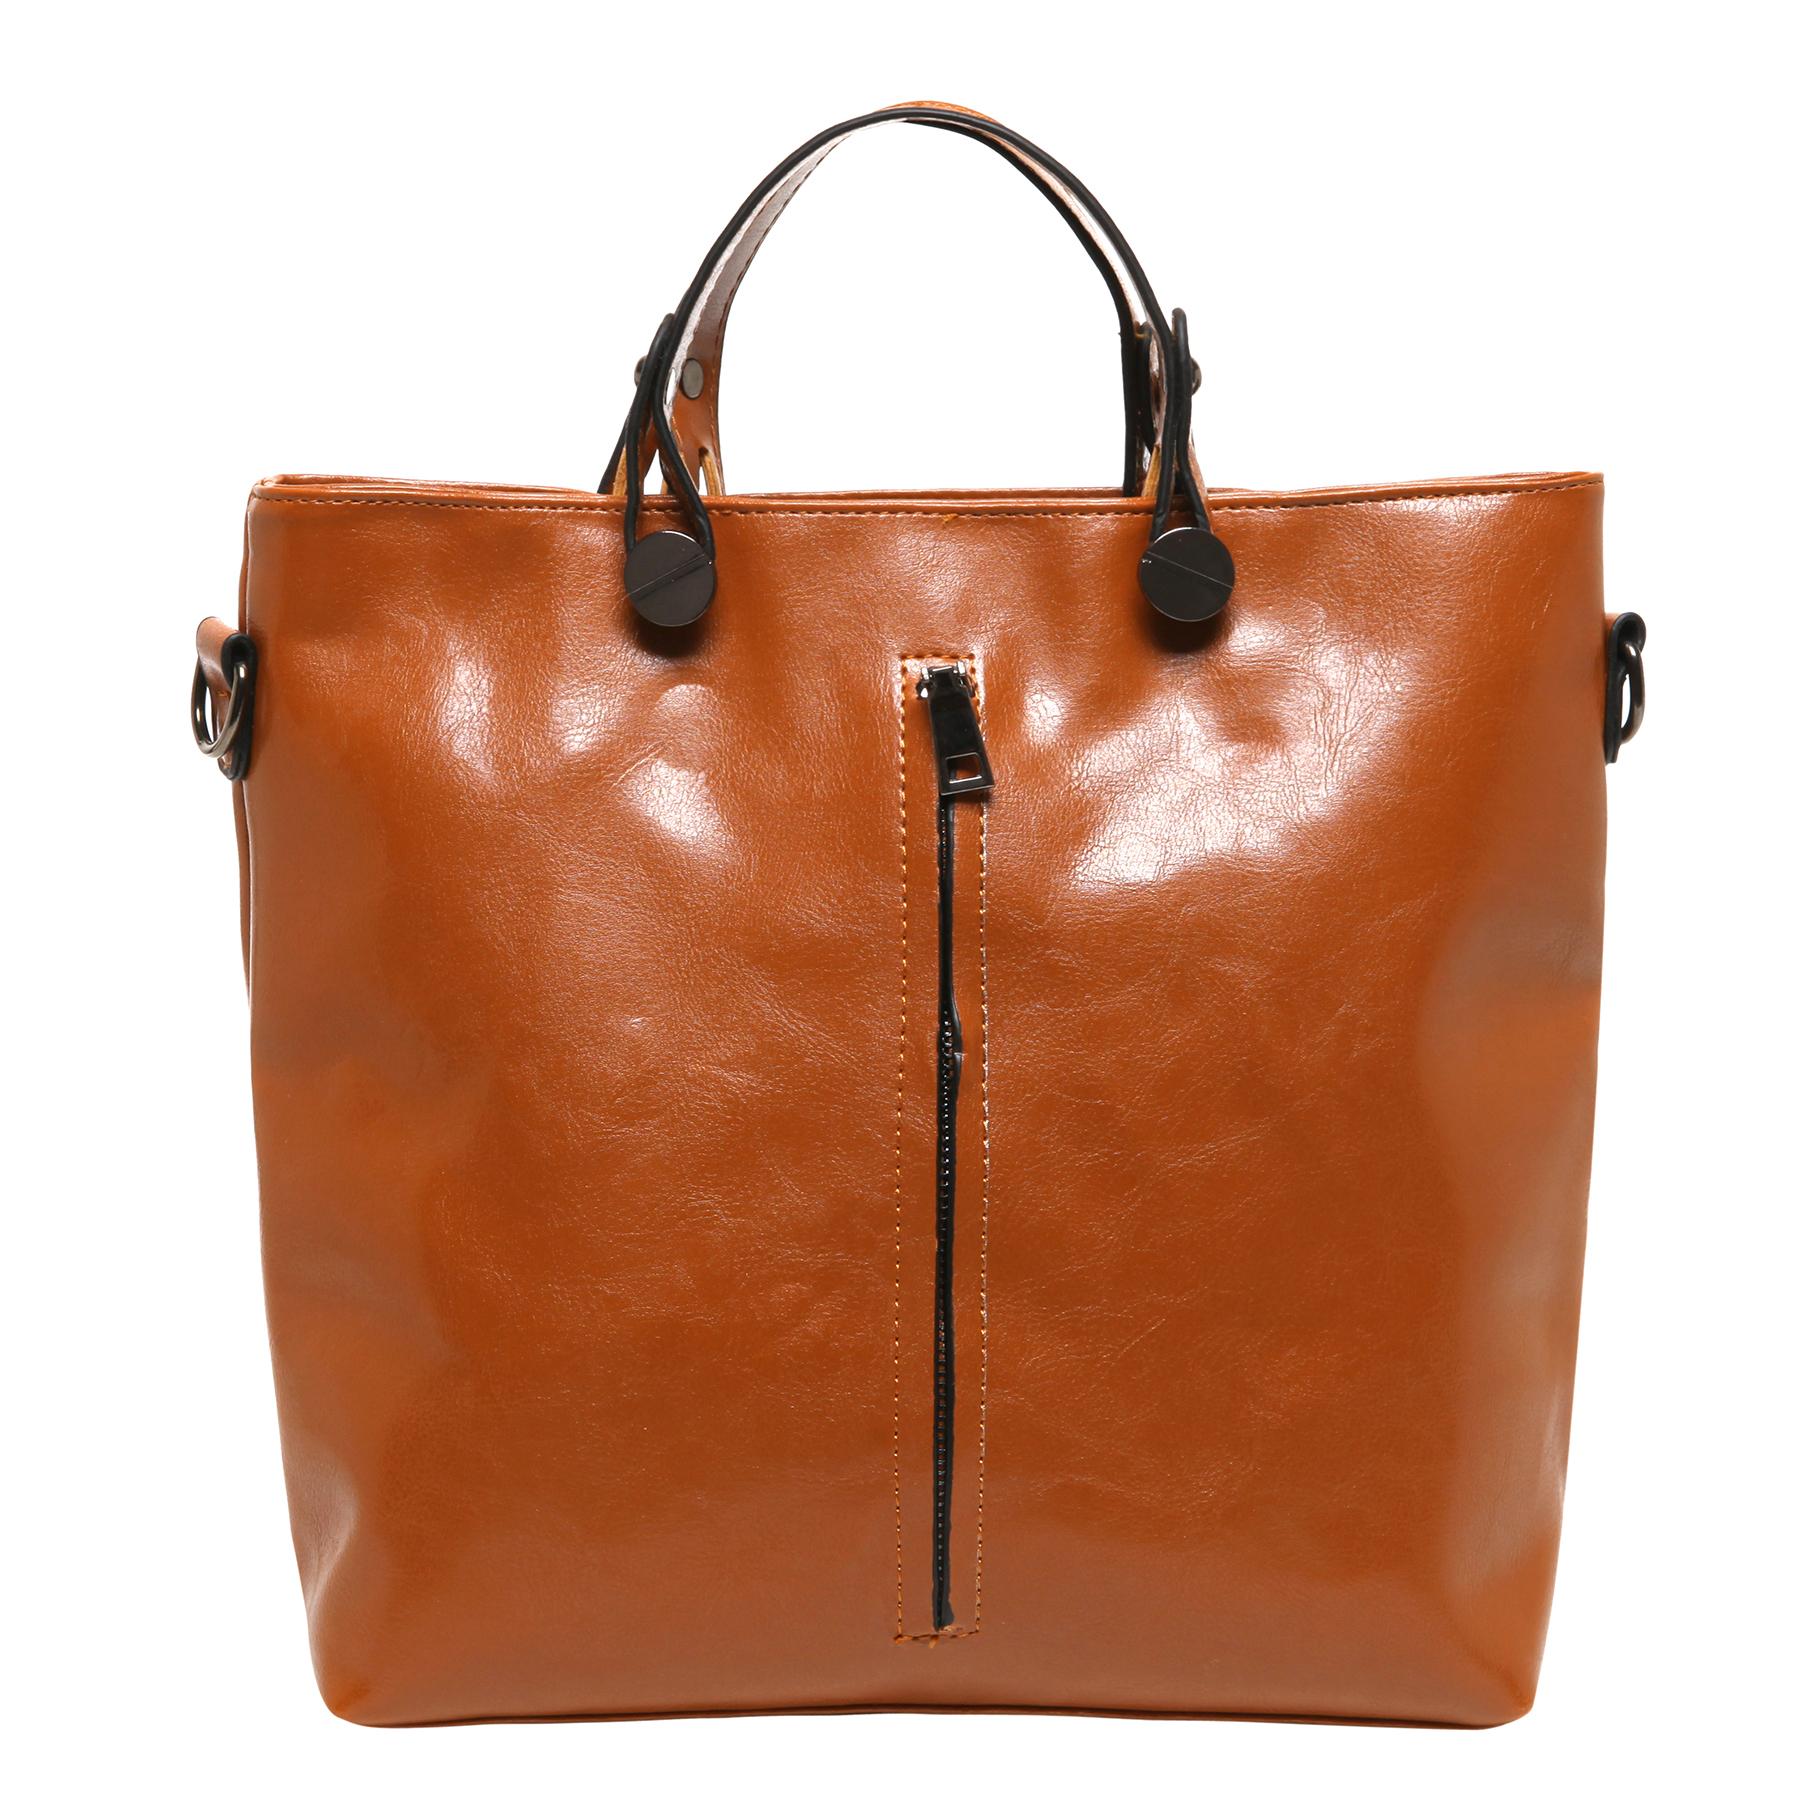 ALDIS Brown Top Handle Office Tote Handbag front